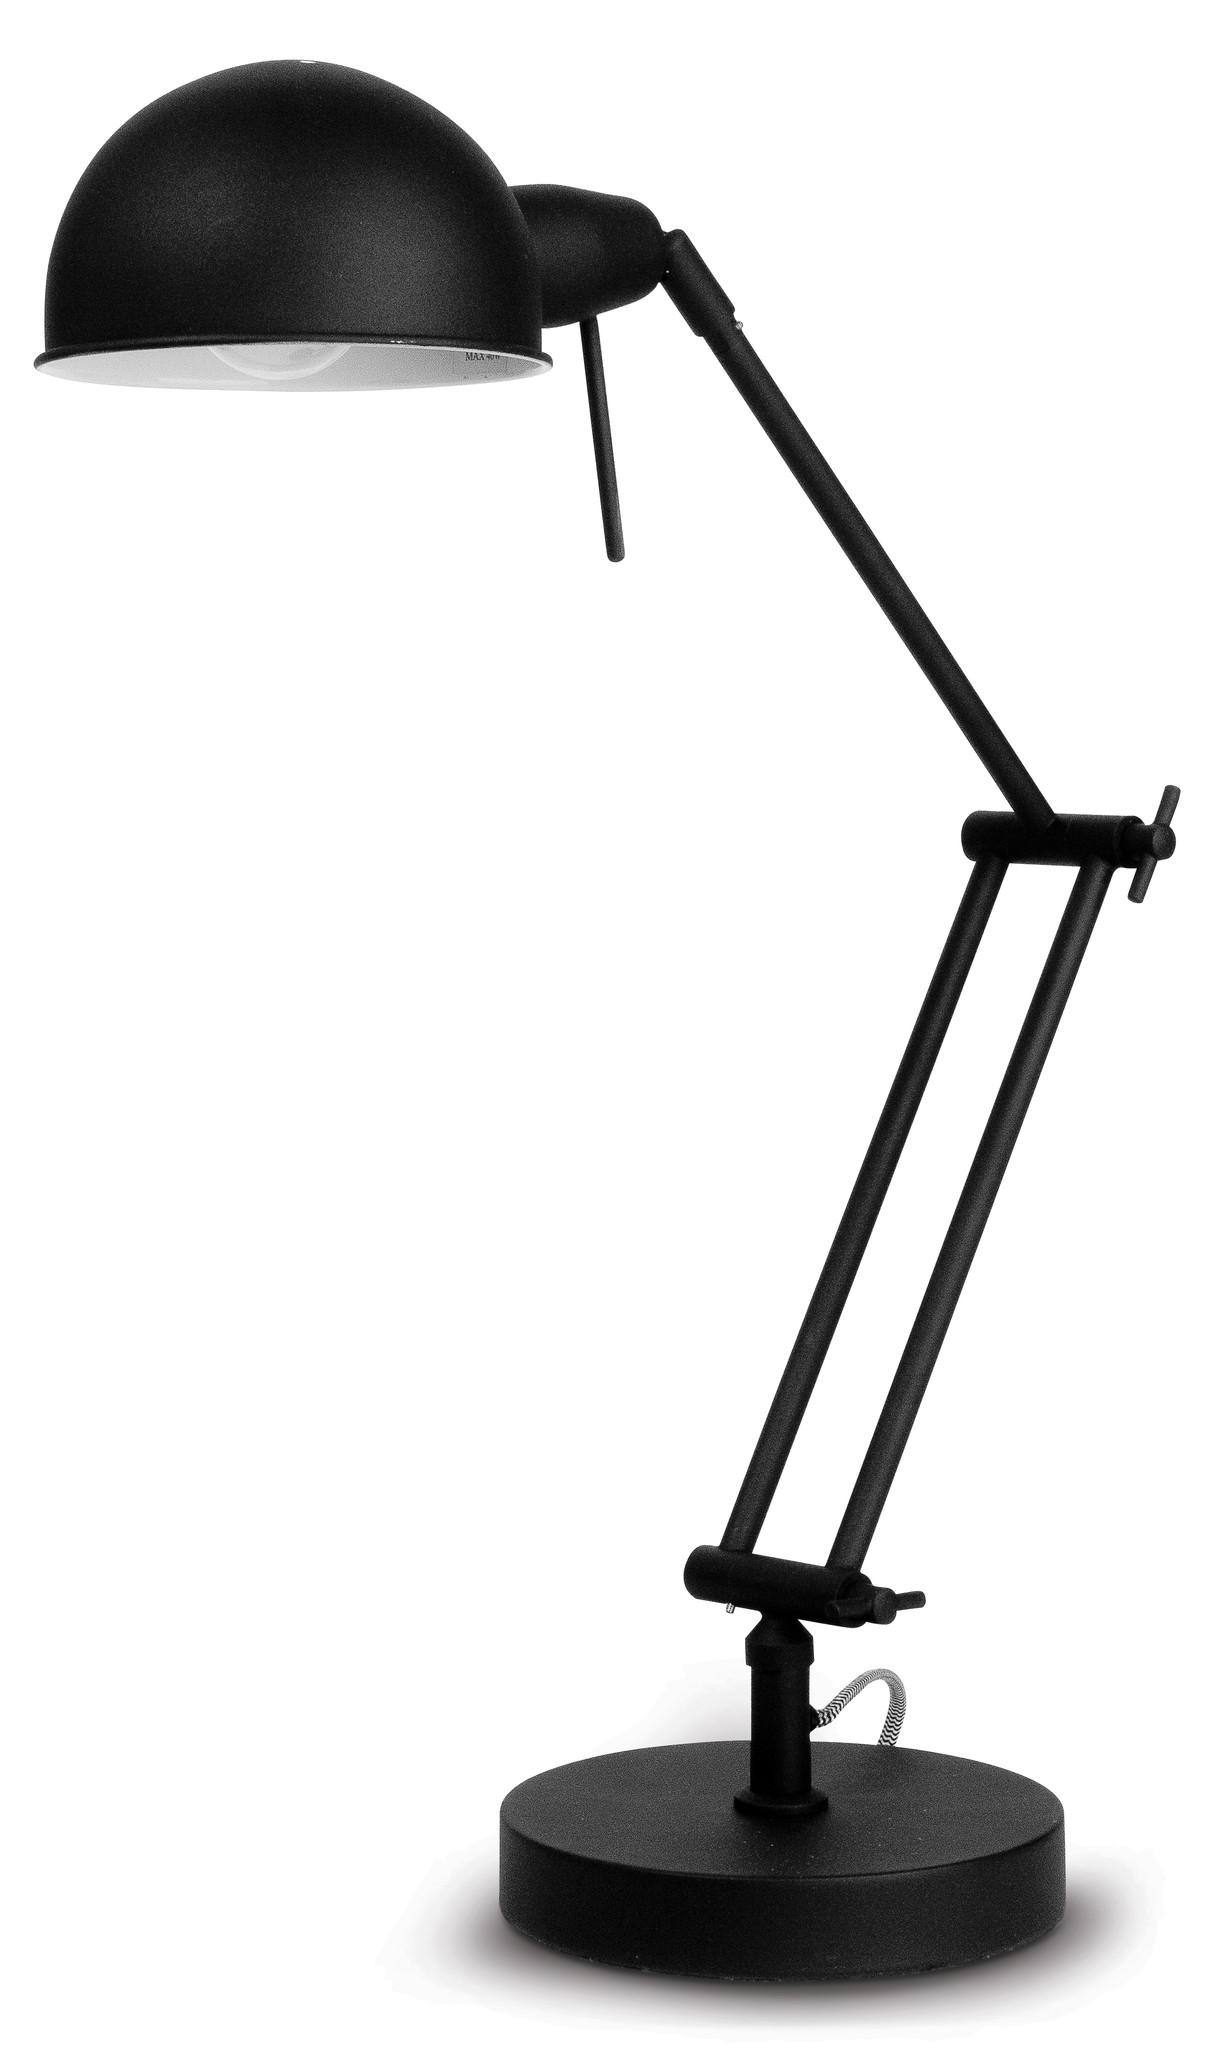 Tafellamp Glasgow ijzer zwart-1